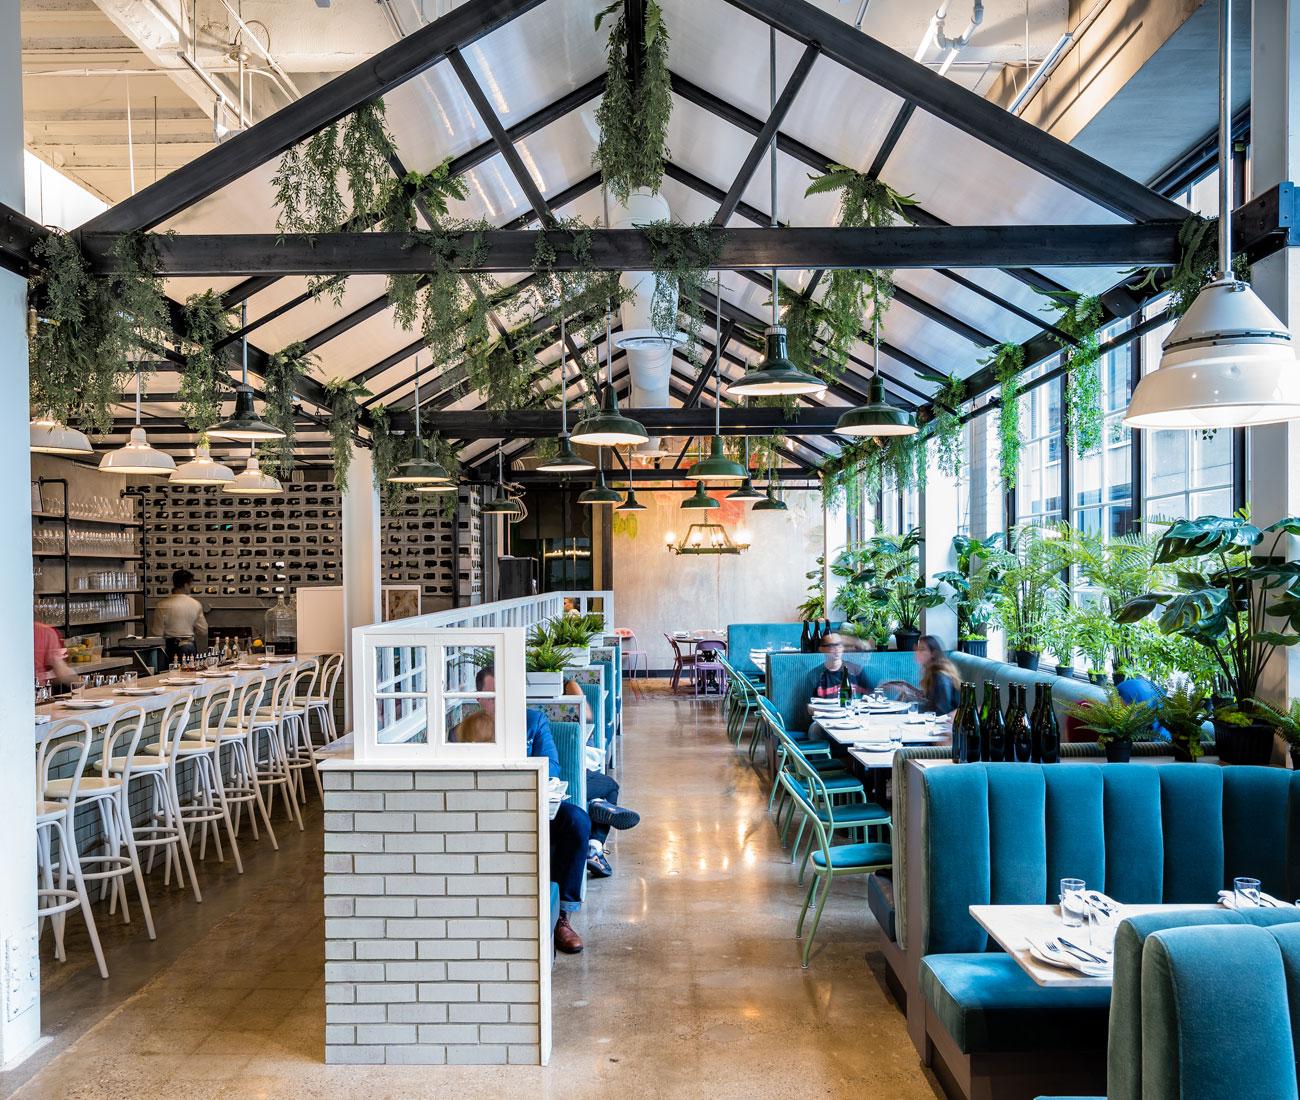 Rosalinda Restaurant Brings Greenhouse Vibes To The City Designlines Magazine